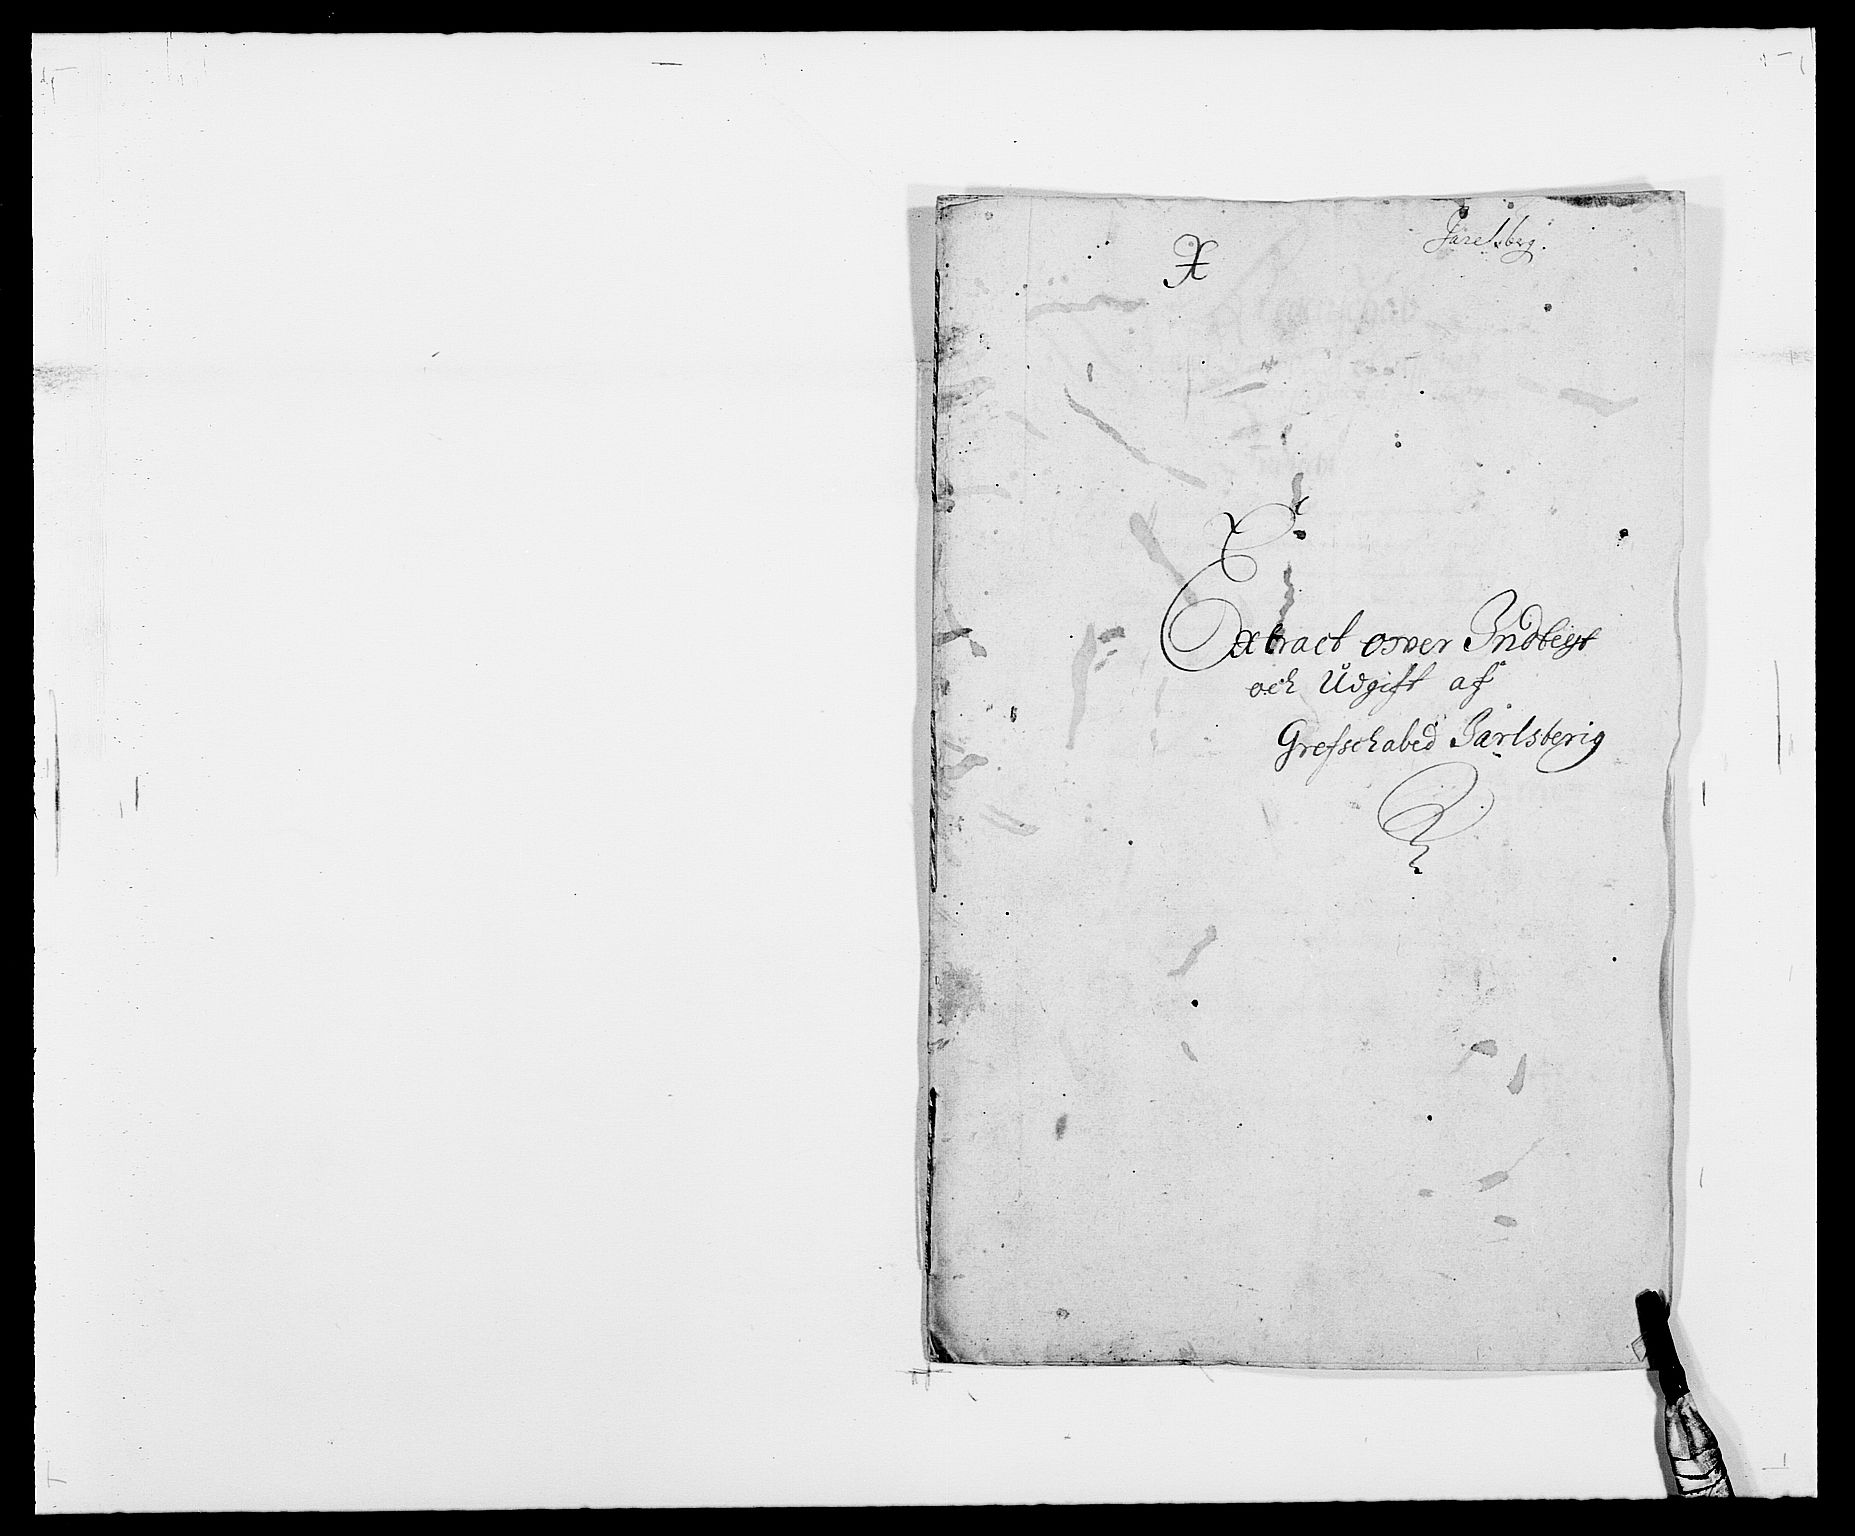 RA, Rentekammeret inntil 1814, Reviderte regnskaper, Fogderegnskap, R32/L1858: Fogderegnskap Jarlsberg grevskap, 1686-1690, s. 1